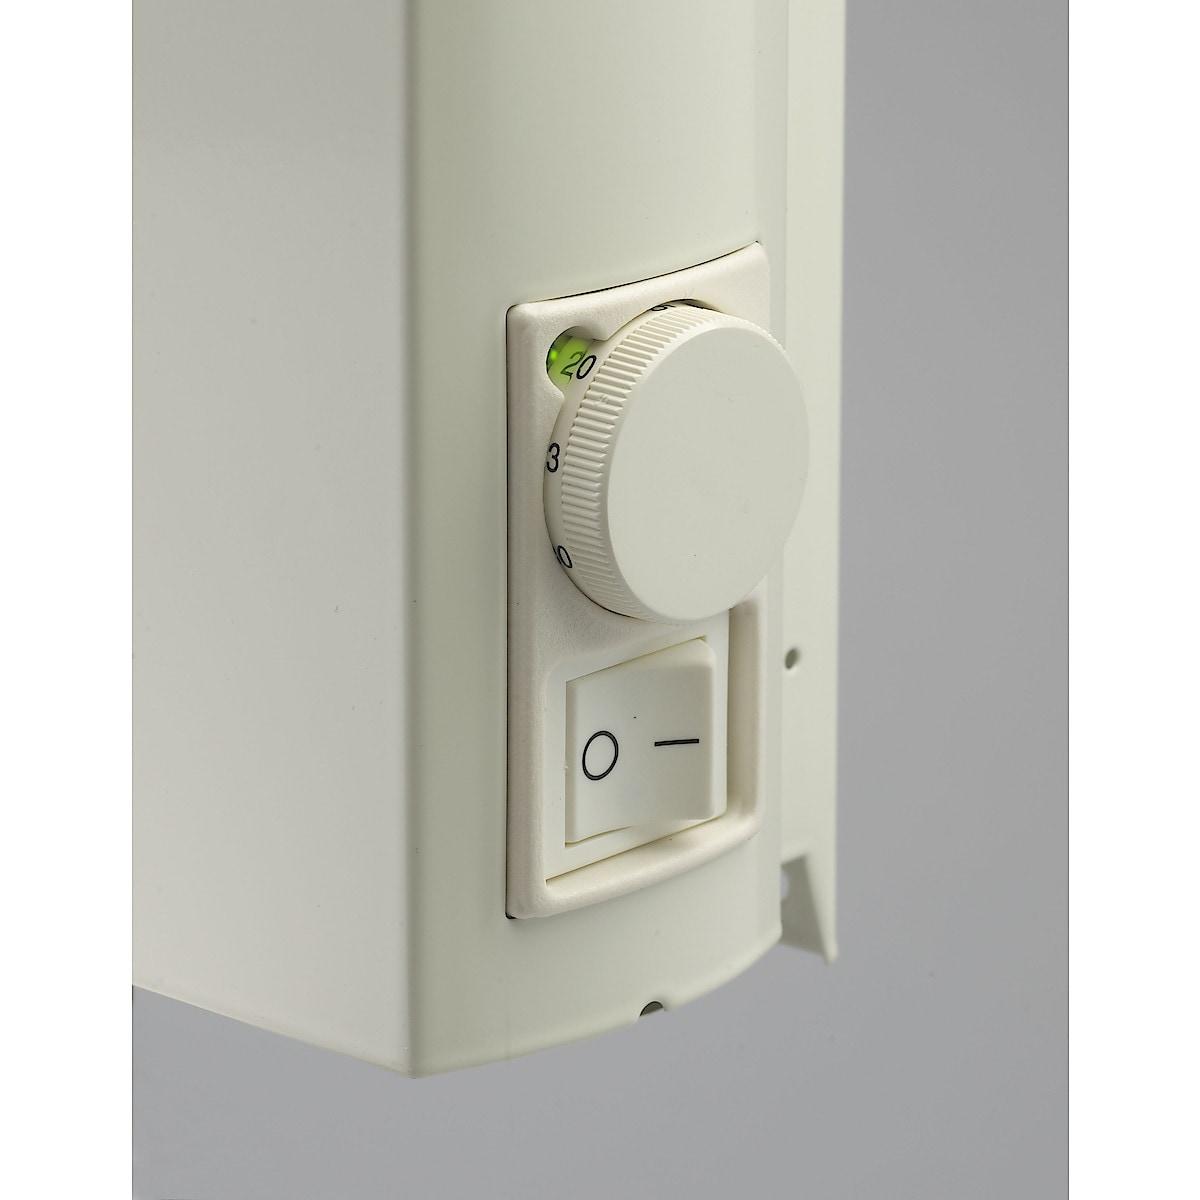 Våtrumselement 600 W 230 V Adax VPS1006